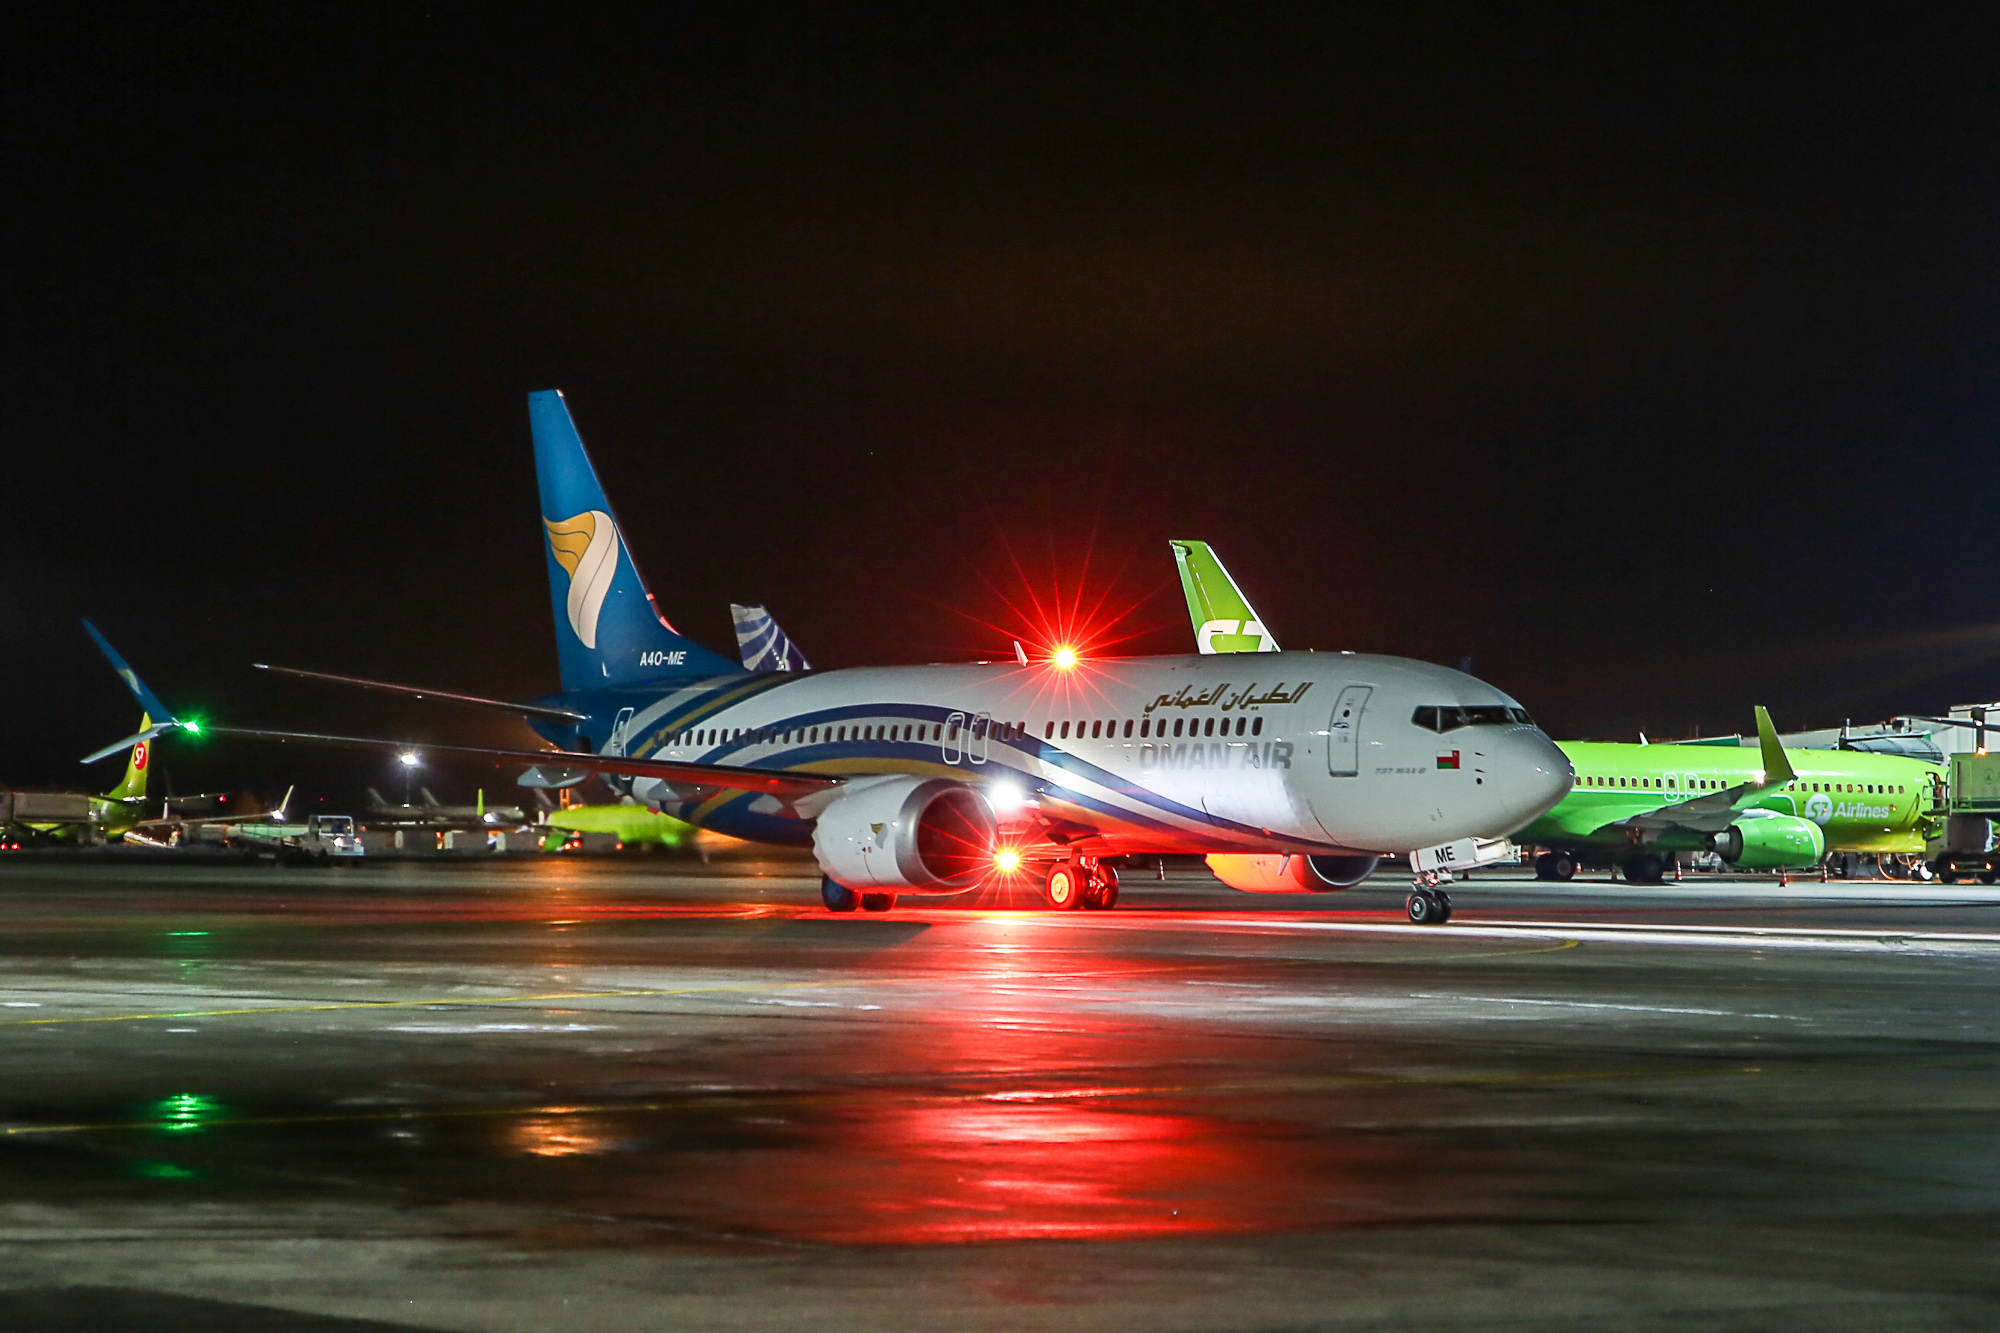 Самолет Boeing 737 MAX 8 авиакомпании Oman Air в аэропорту Домодедово